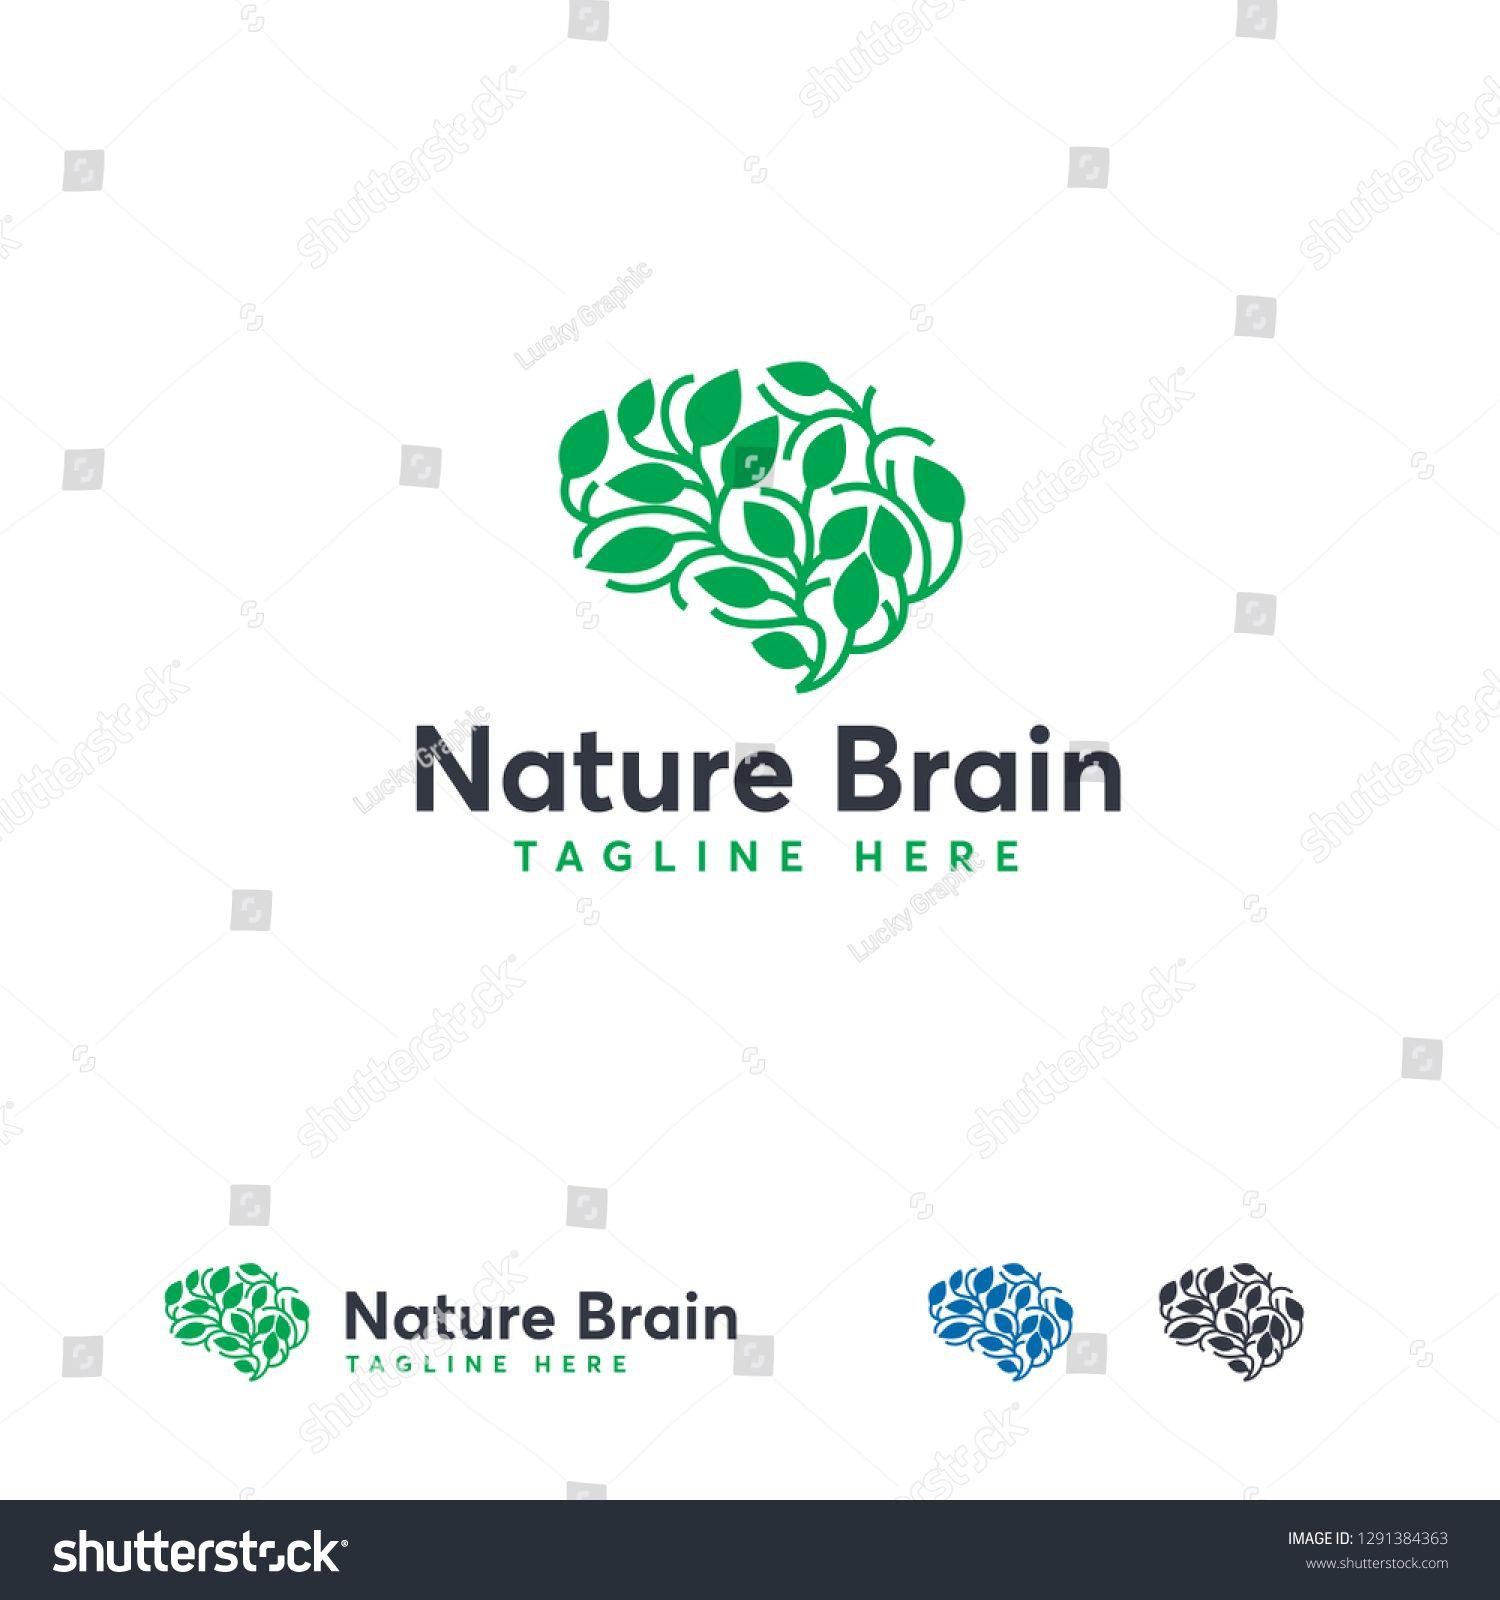 Health Brain logo designs concept vector, Nature Mind logo